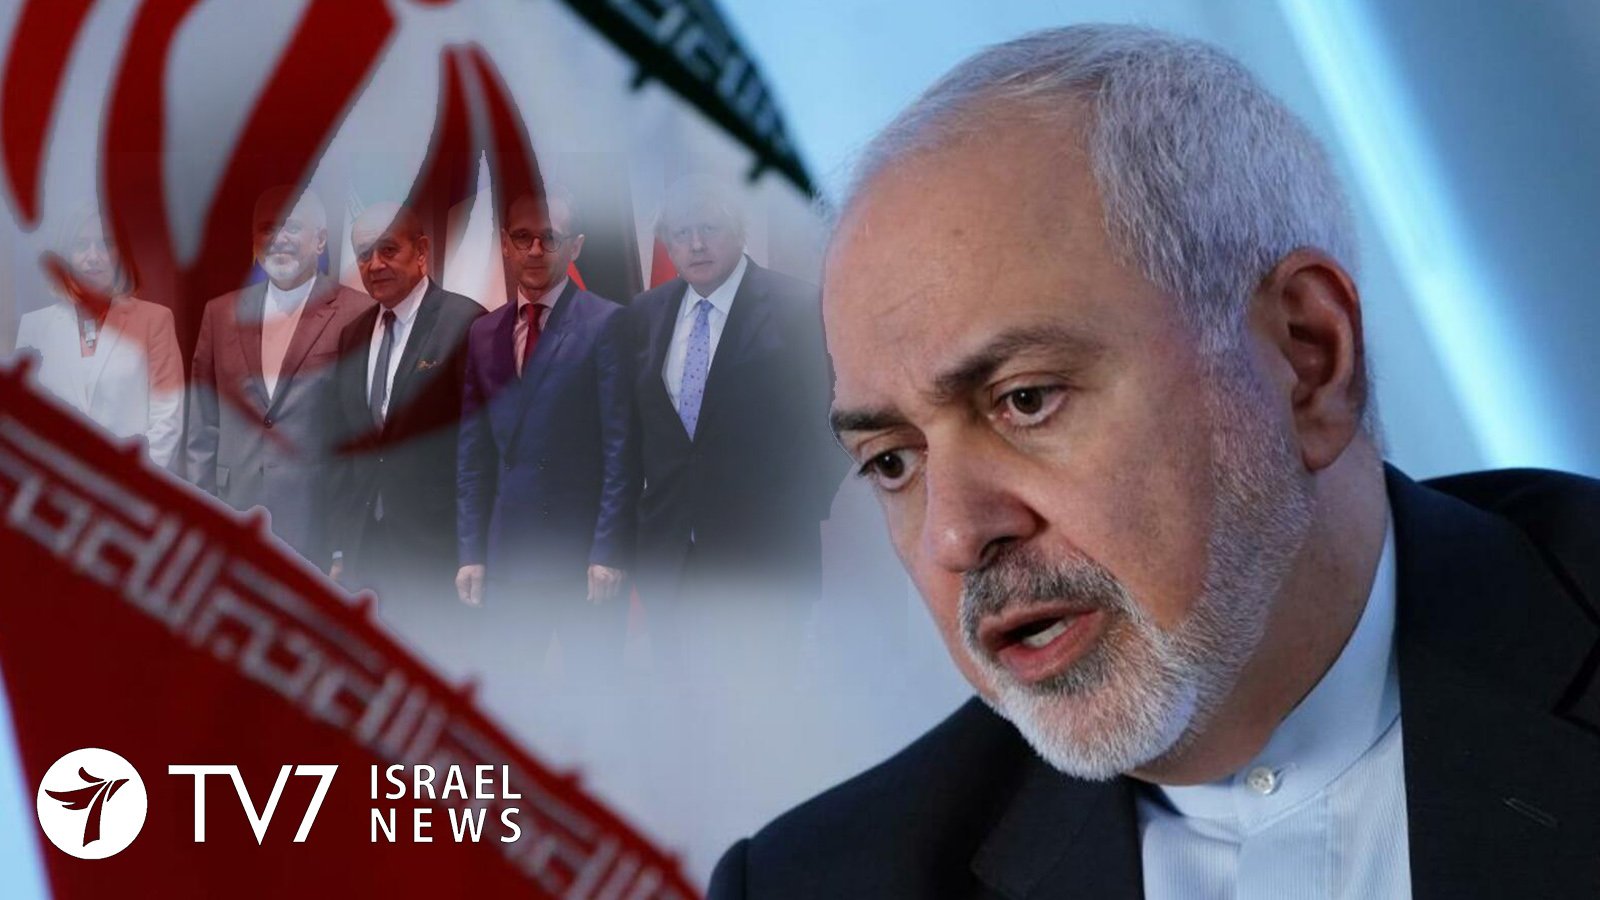 Iran demands Europe's defiance of US sanctions